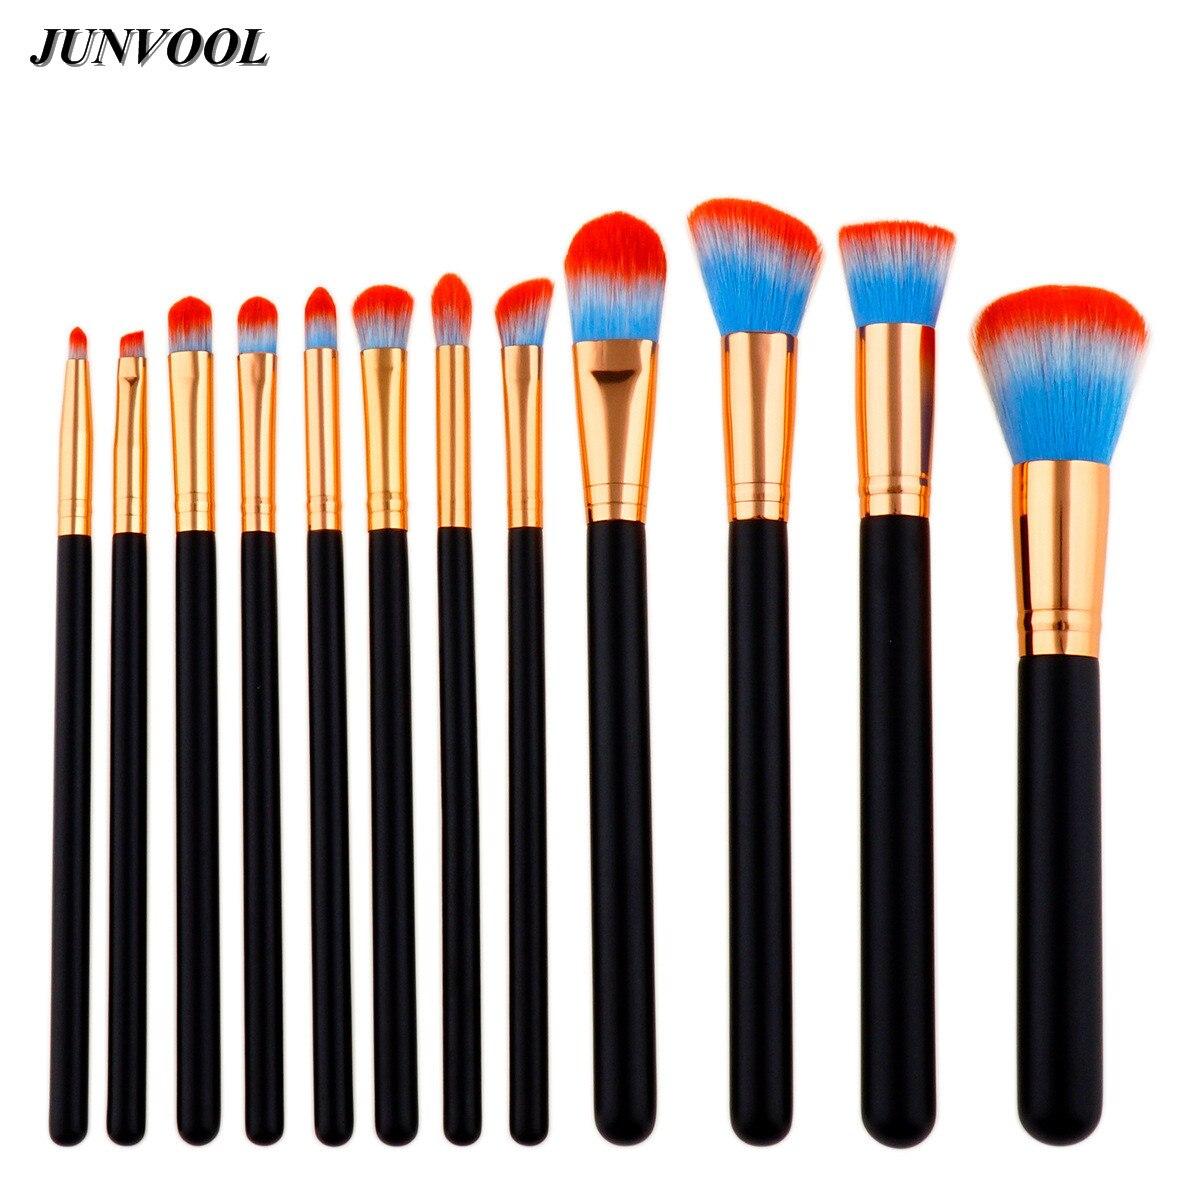 Pro Powder Brush Black Rose Gold 12Pcs Makeup Brushes Set Blue Red Synthetic Hair Make Up Tools Cosmetic Foundation Brush Kits mac splash and last pro longwear powder устойчивая компактная пудра dark tan